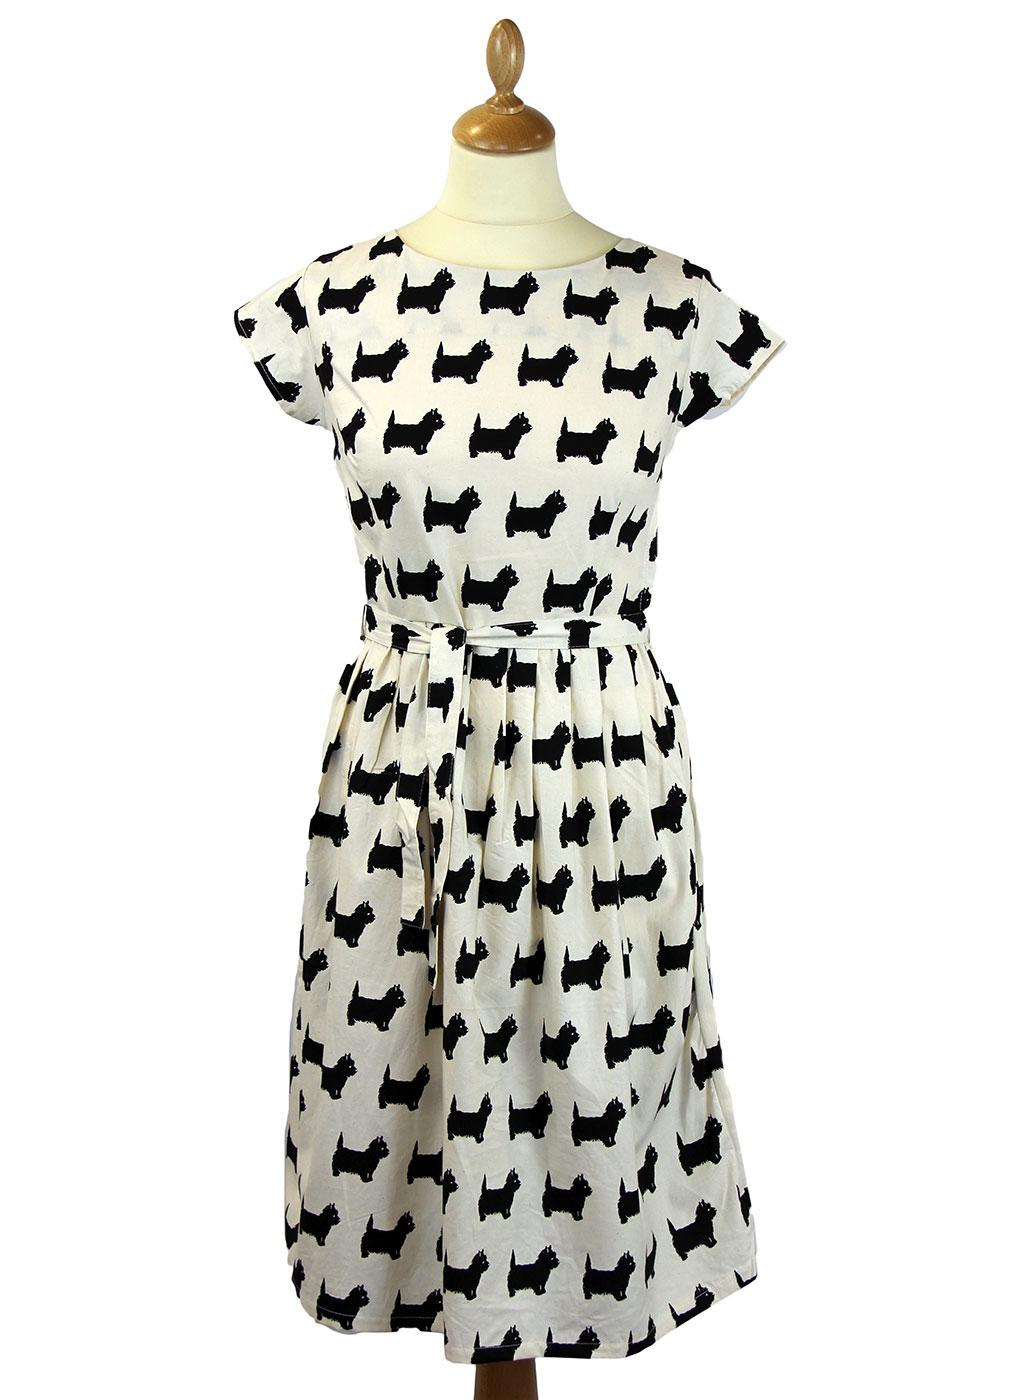 Scottie Dog Retro 1950s Vintage Summer Tea Dress